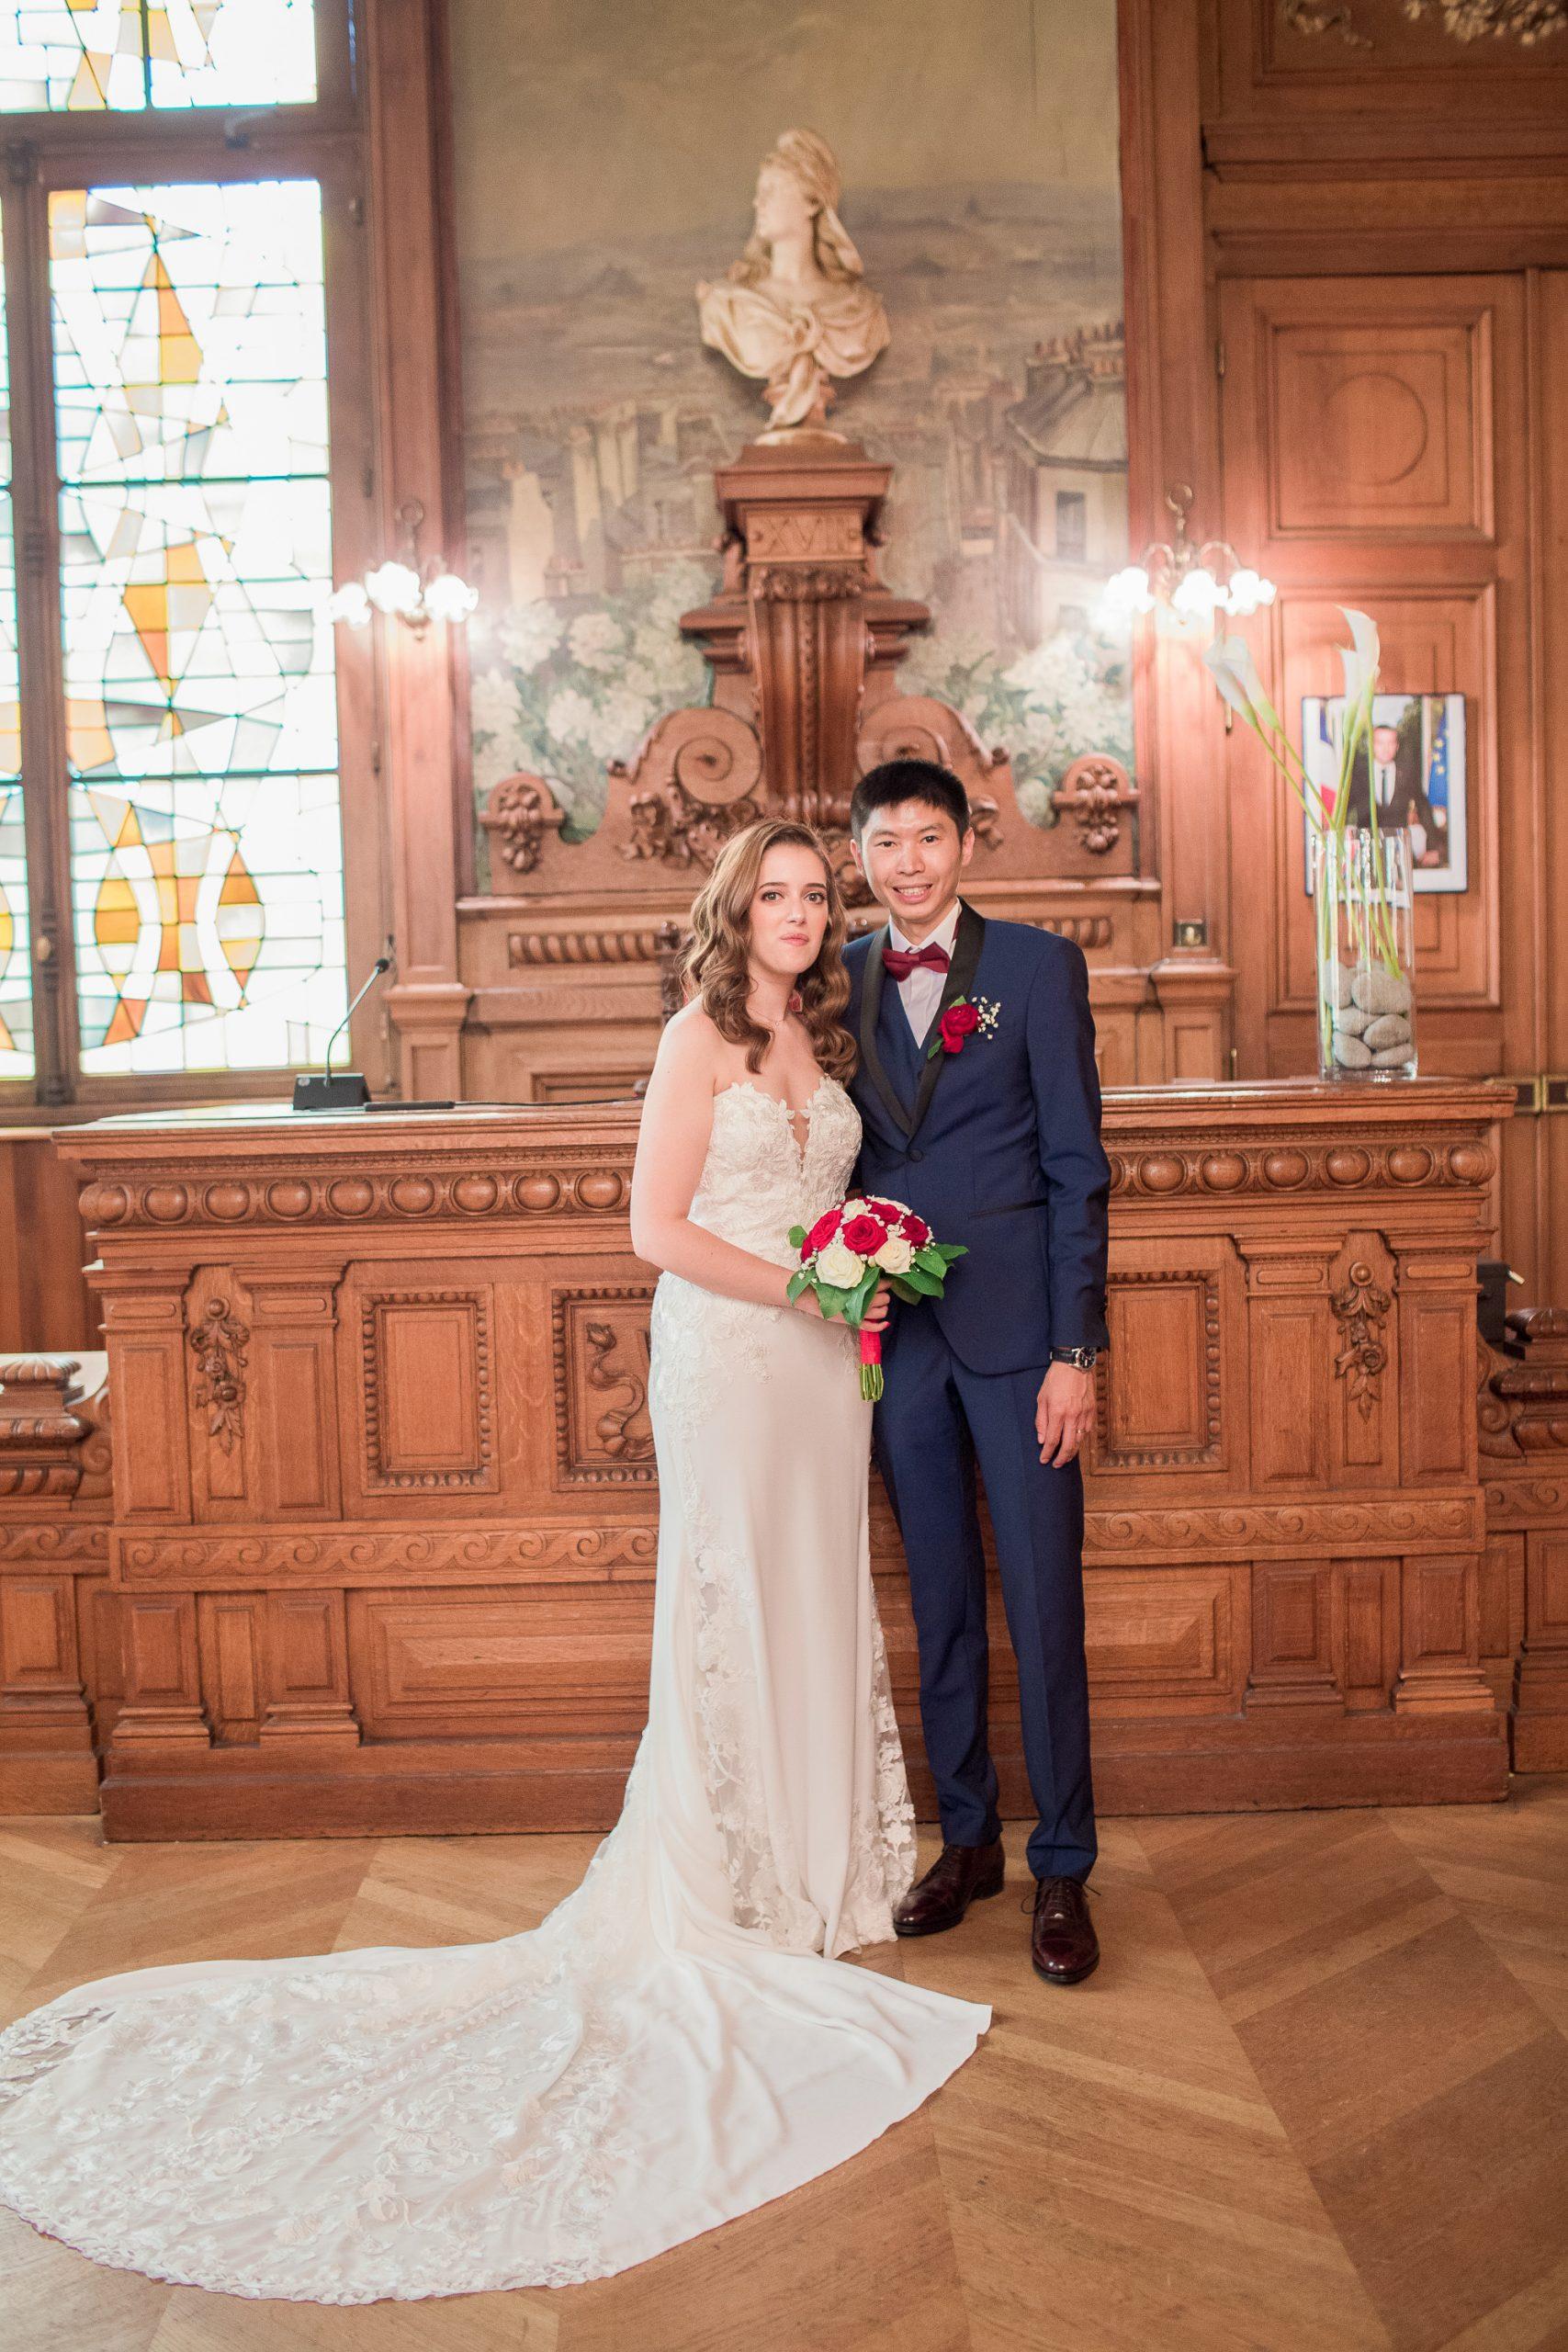 photographie-mariage-ceremonie-civile-paris-18